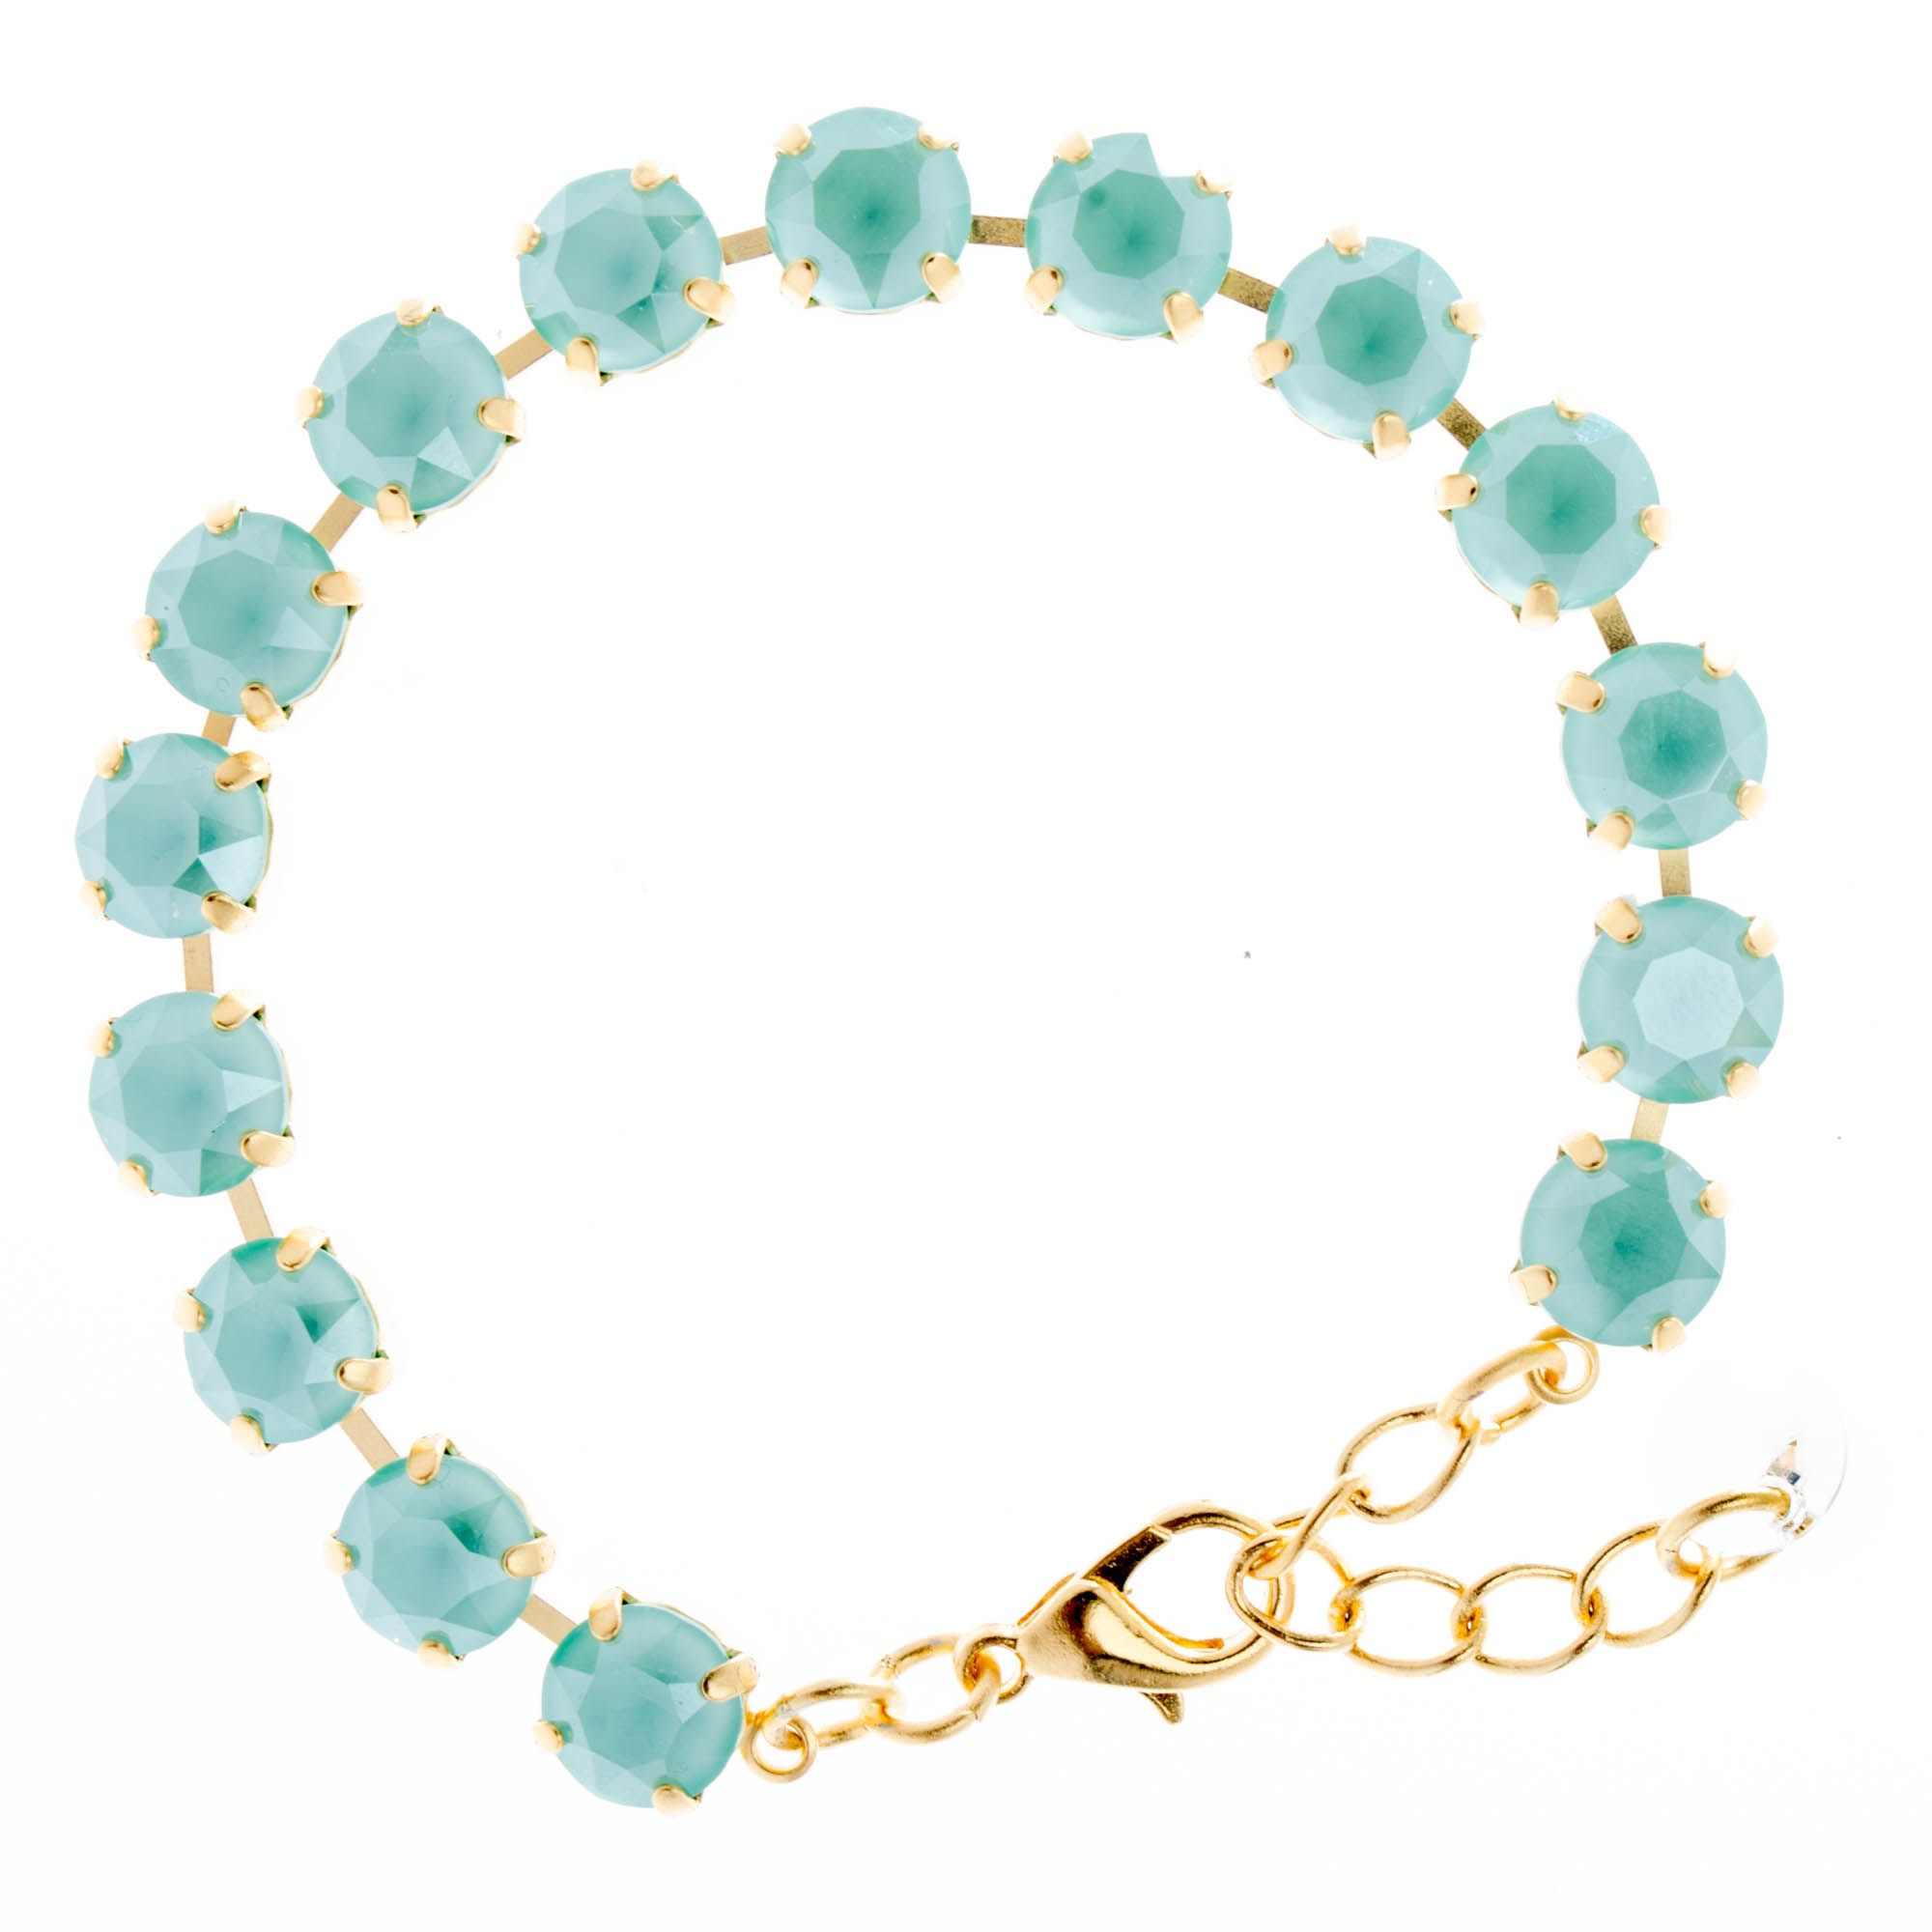 ef2a78760a859 YPMCO 8mm Swarovski Crystal Tennis Bracelet - Assorted Colors